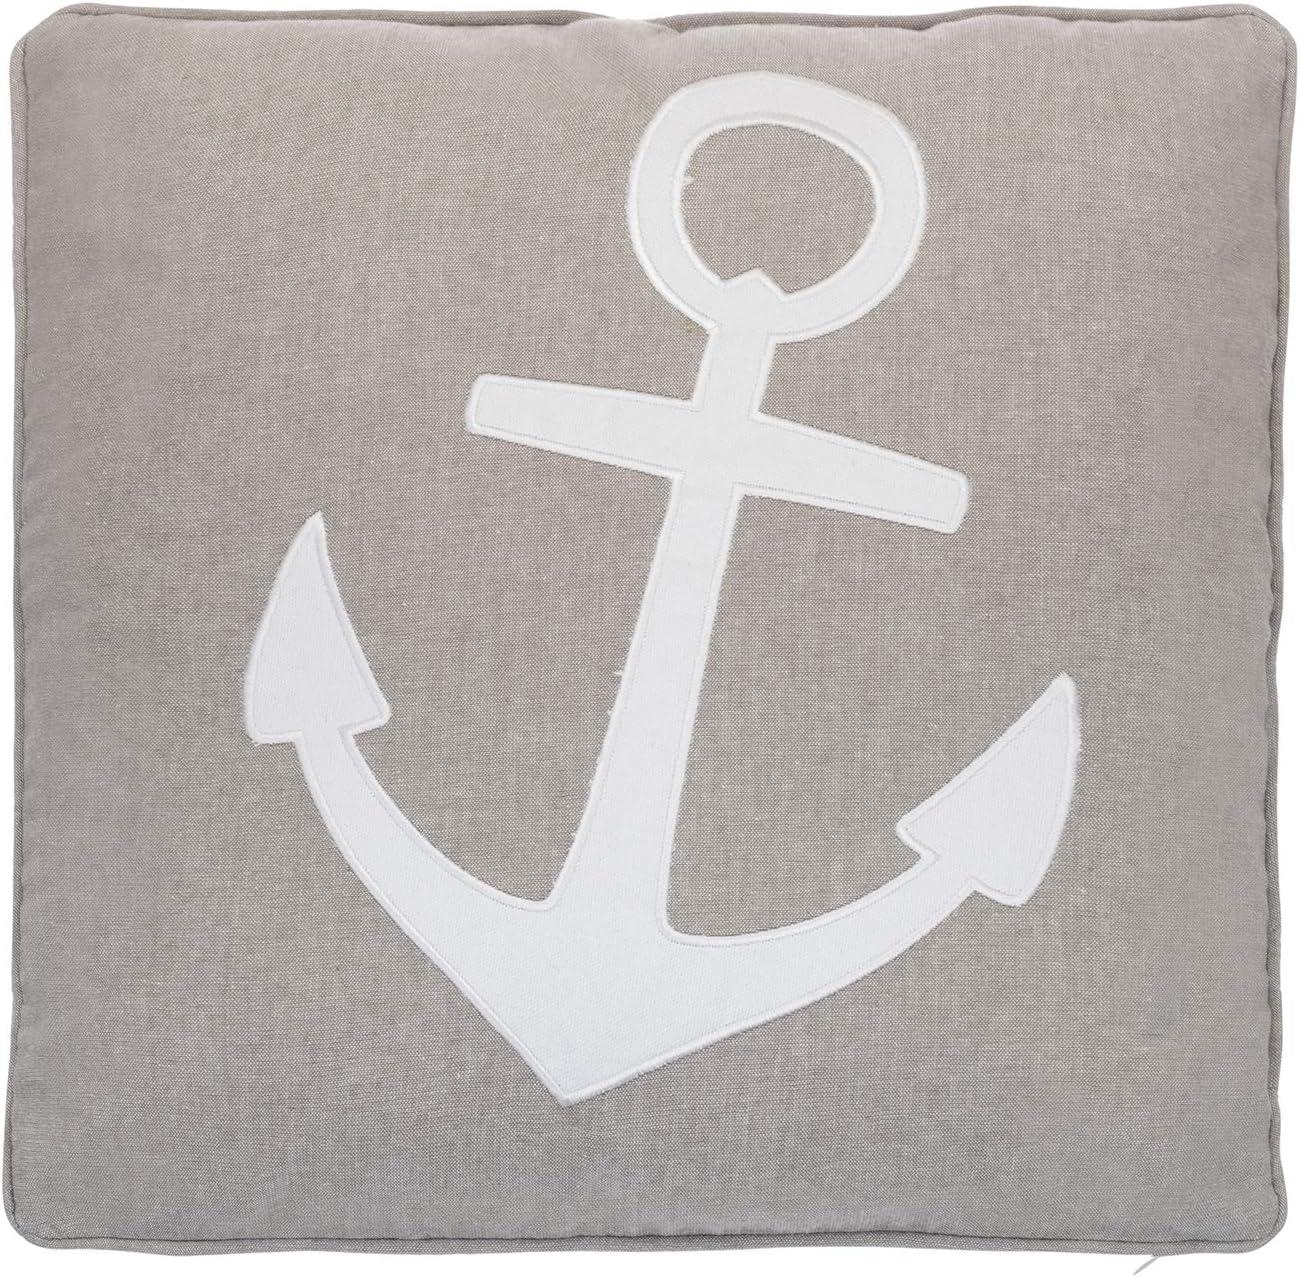 Levtex Home Provincetown Anchor Applique Pillow